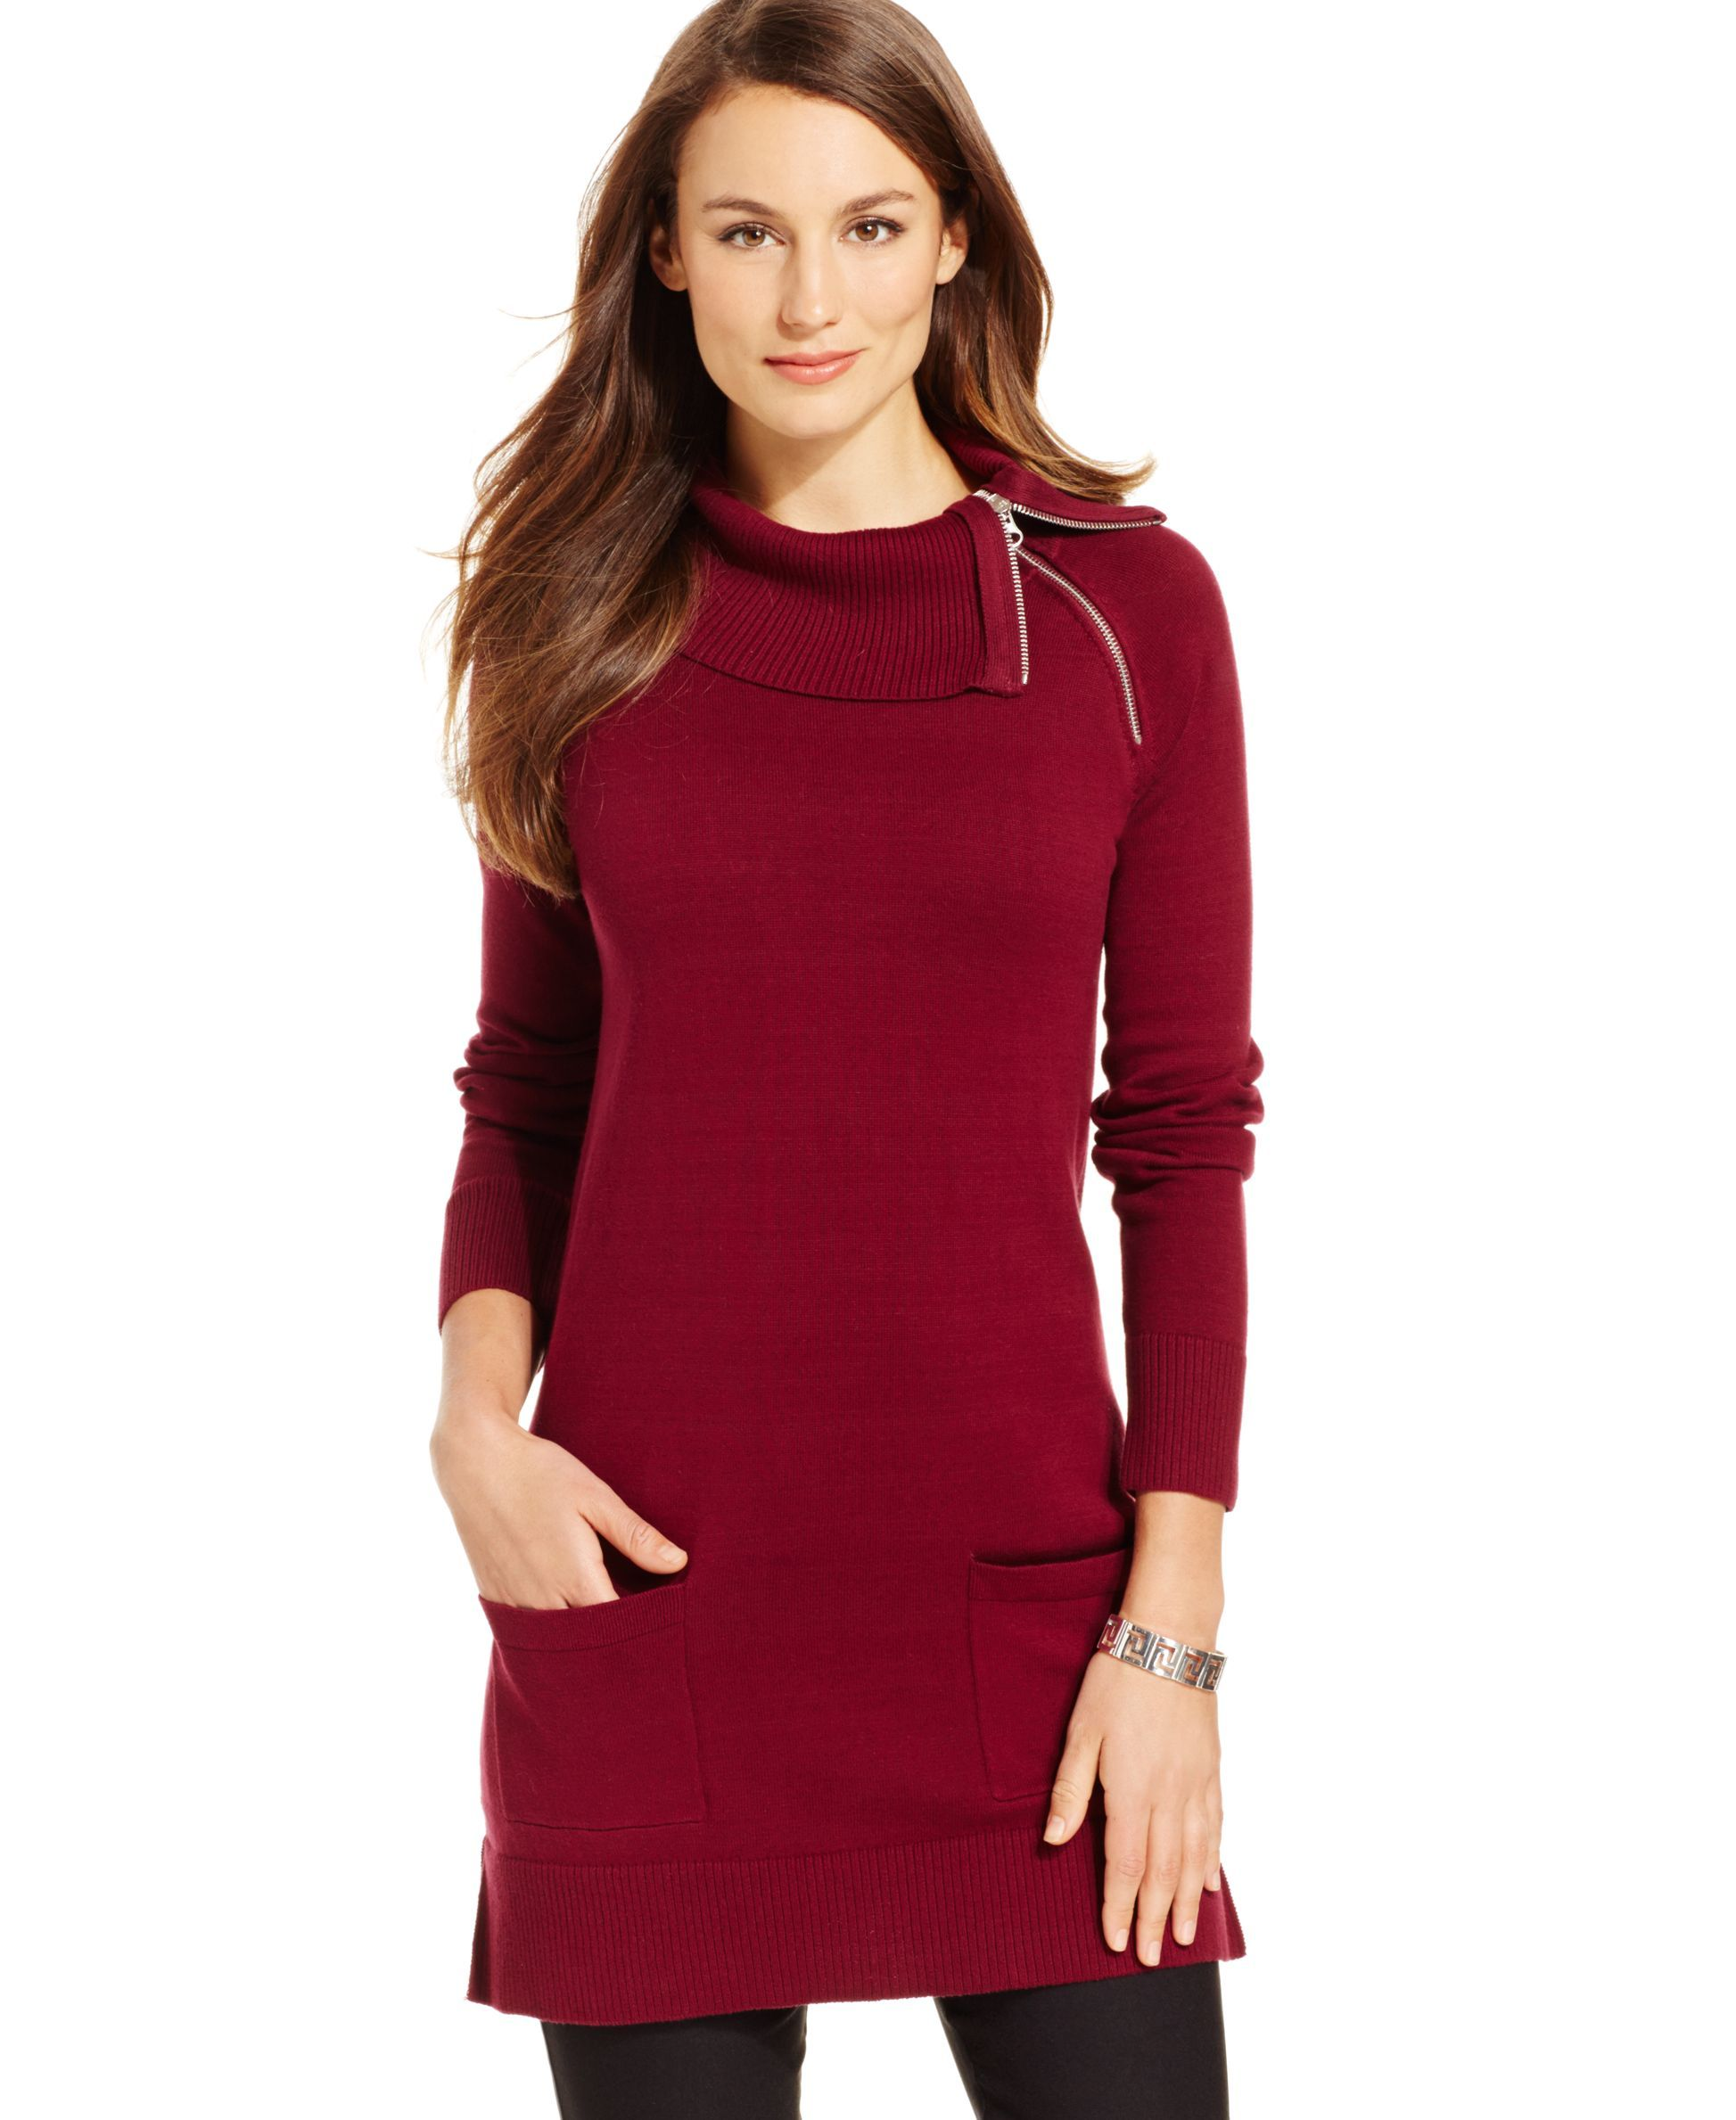 Jeanne Pierre Zipper-Trim Tunic Sweater | Cute outfits | Pinterest ...